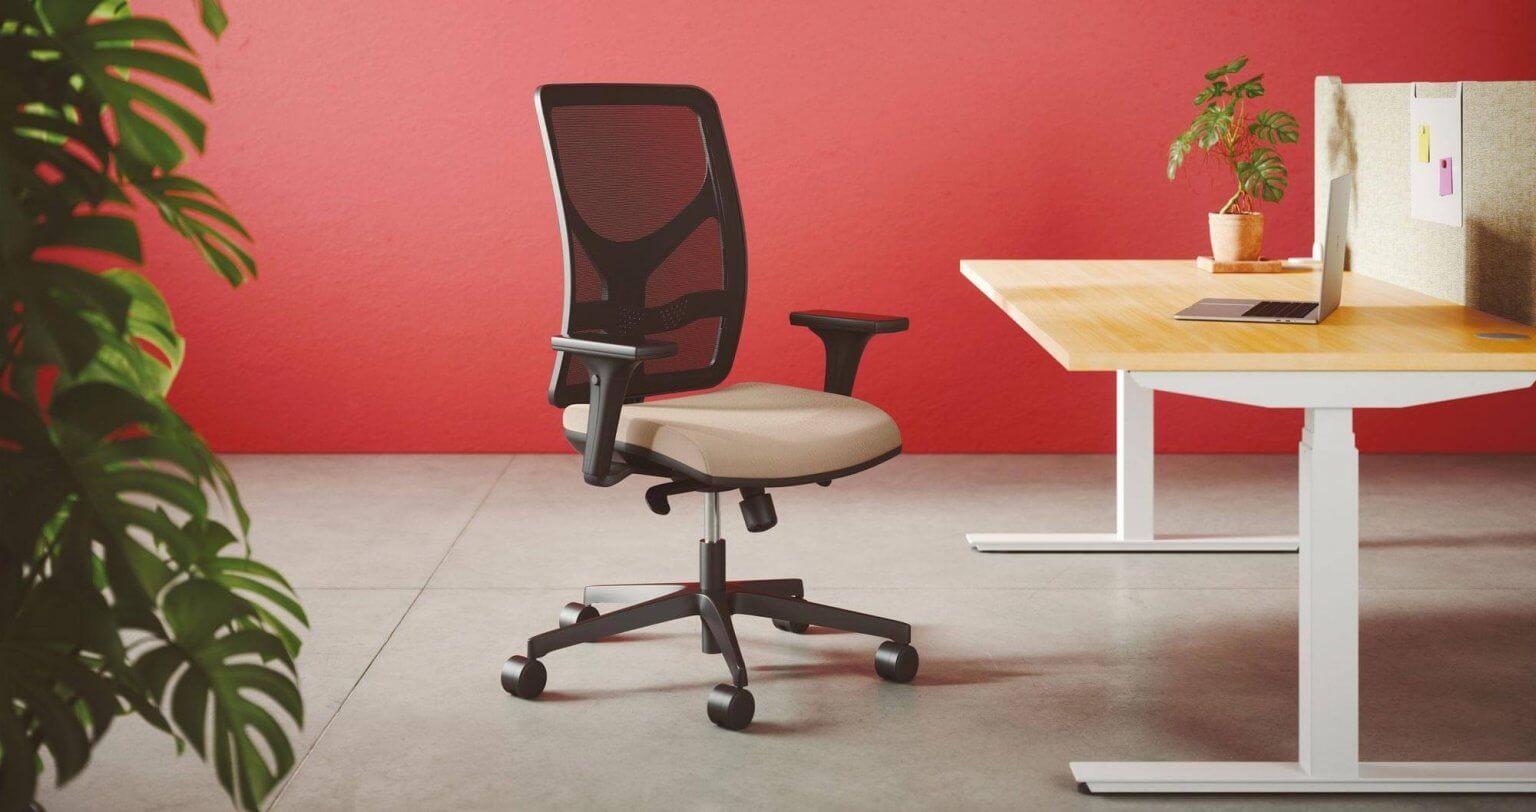 Ergonomie mobilier de bureau